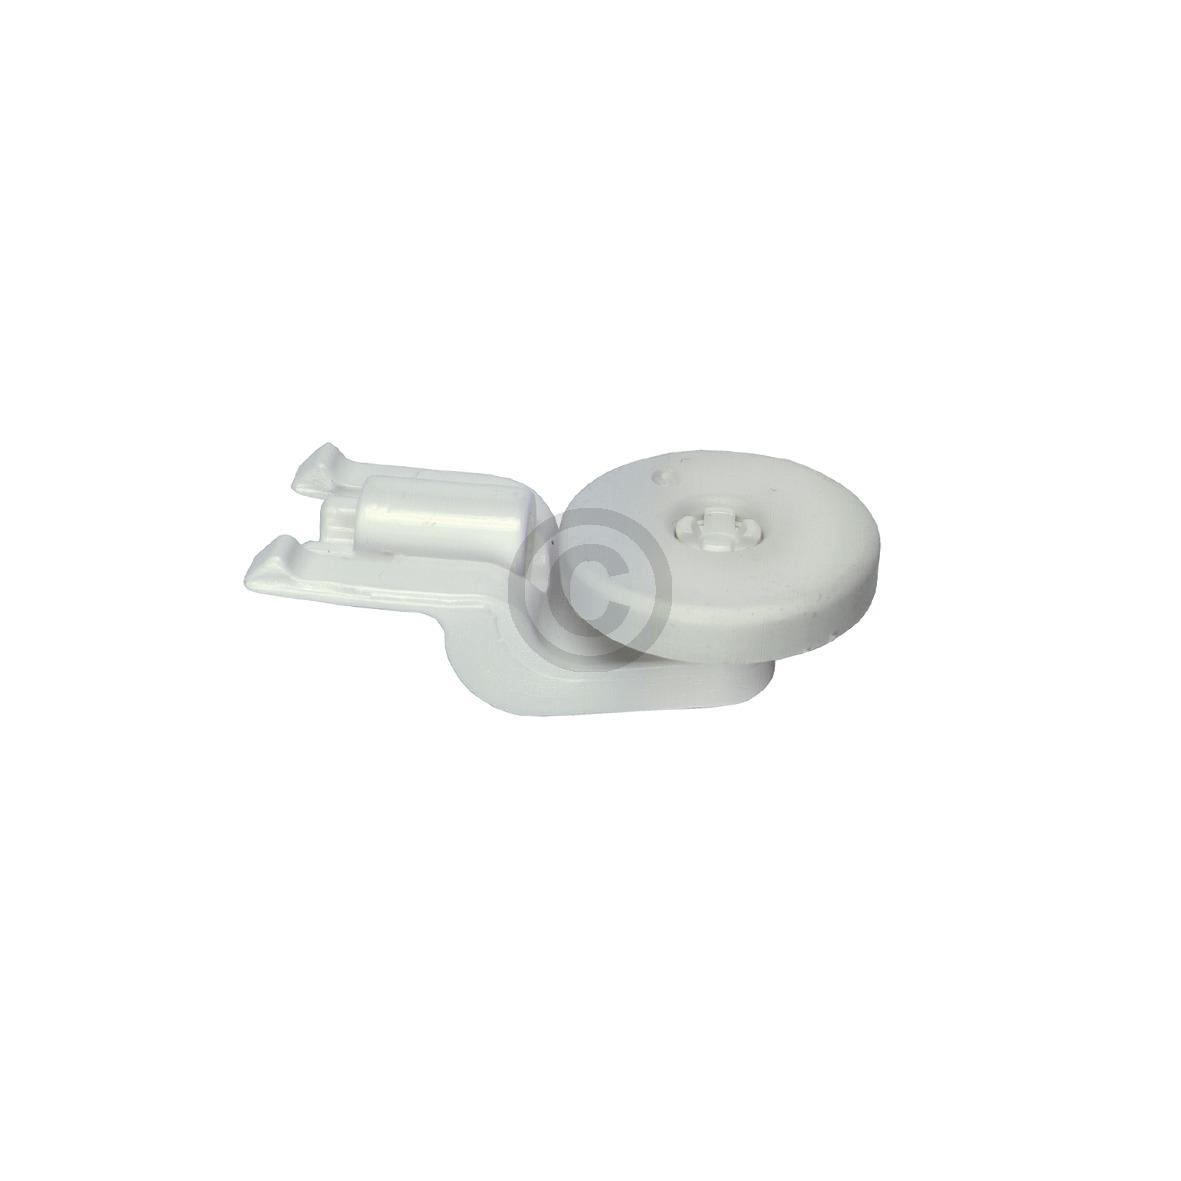 Korbrolle für Unterkorb, 1 Stück 481952888043 Bauknecht, Whirlpool, Ikea